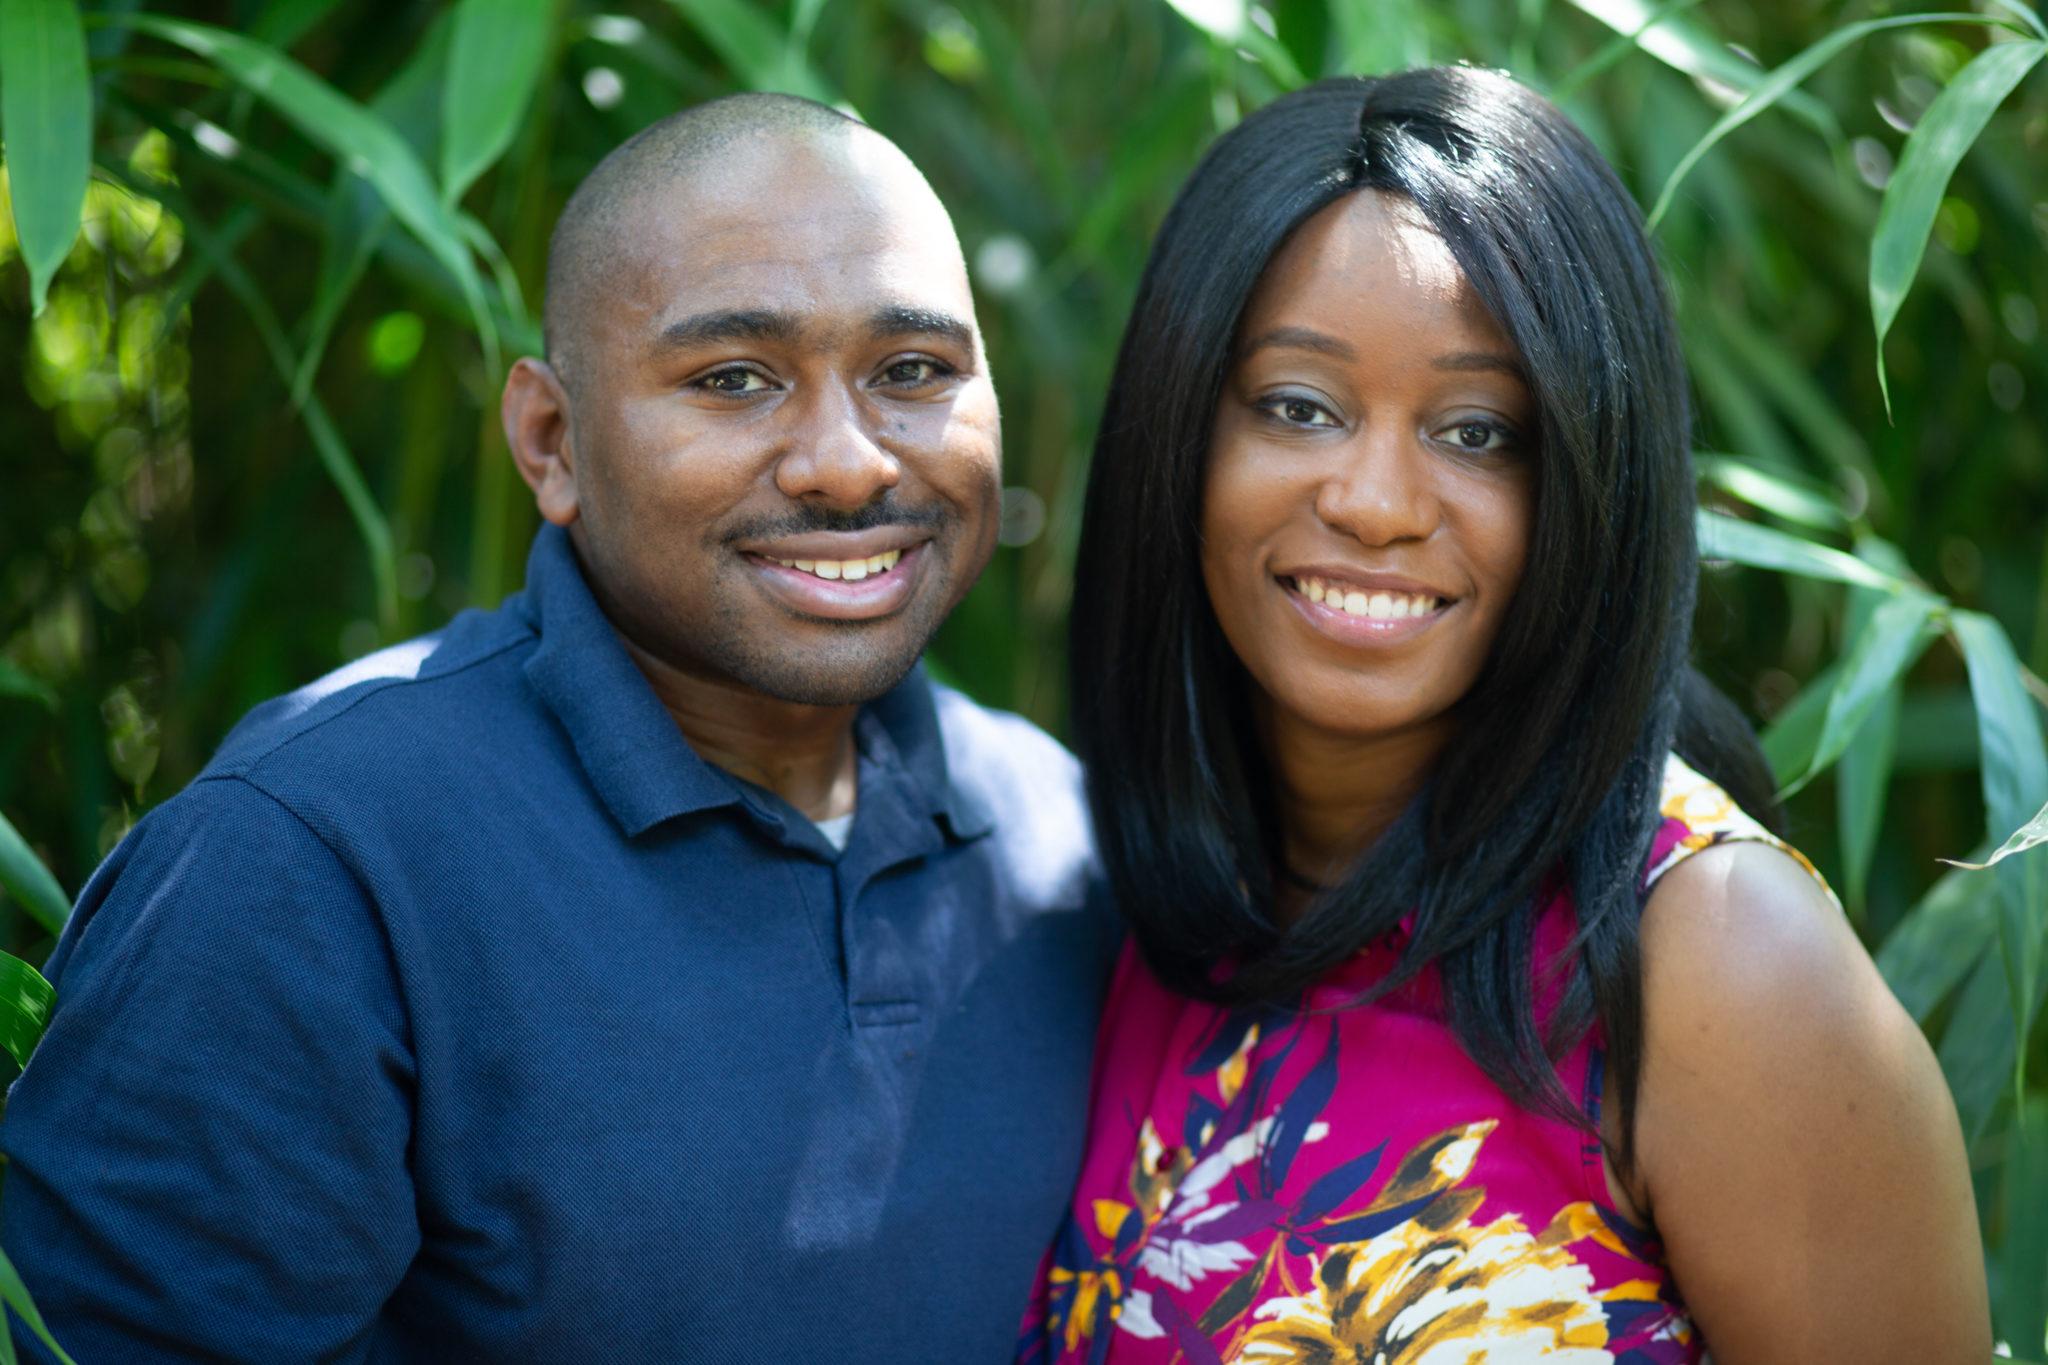 Lifetime Adoptive Parents Ryan and Lindsay